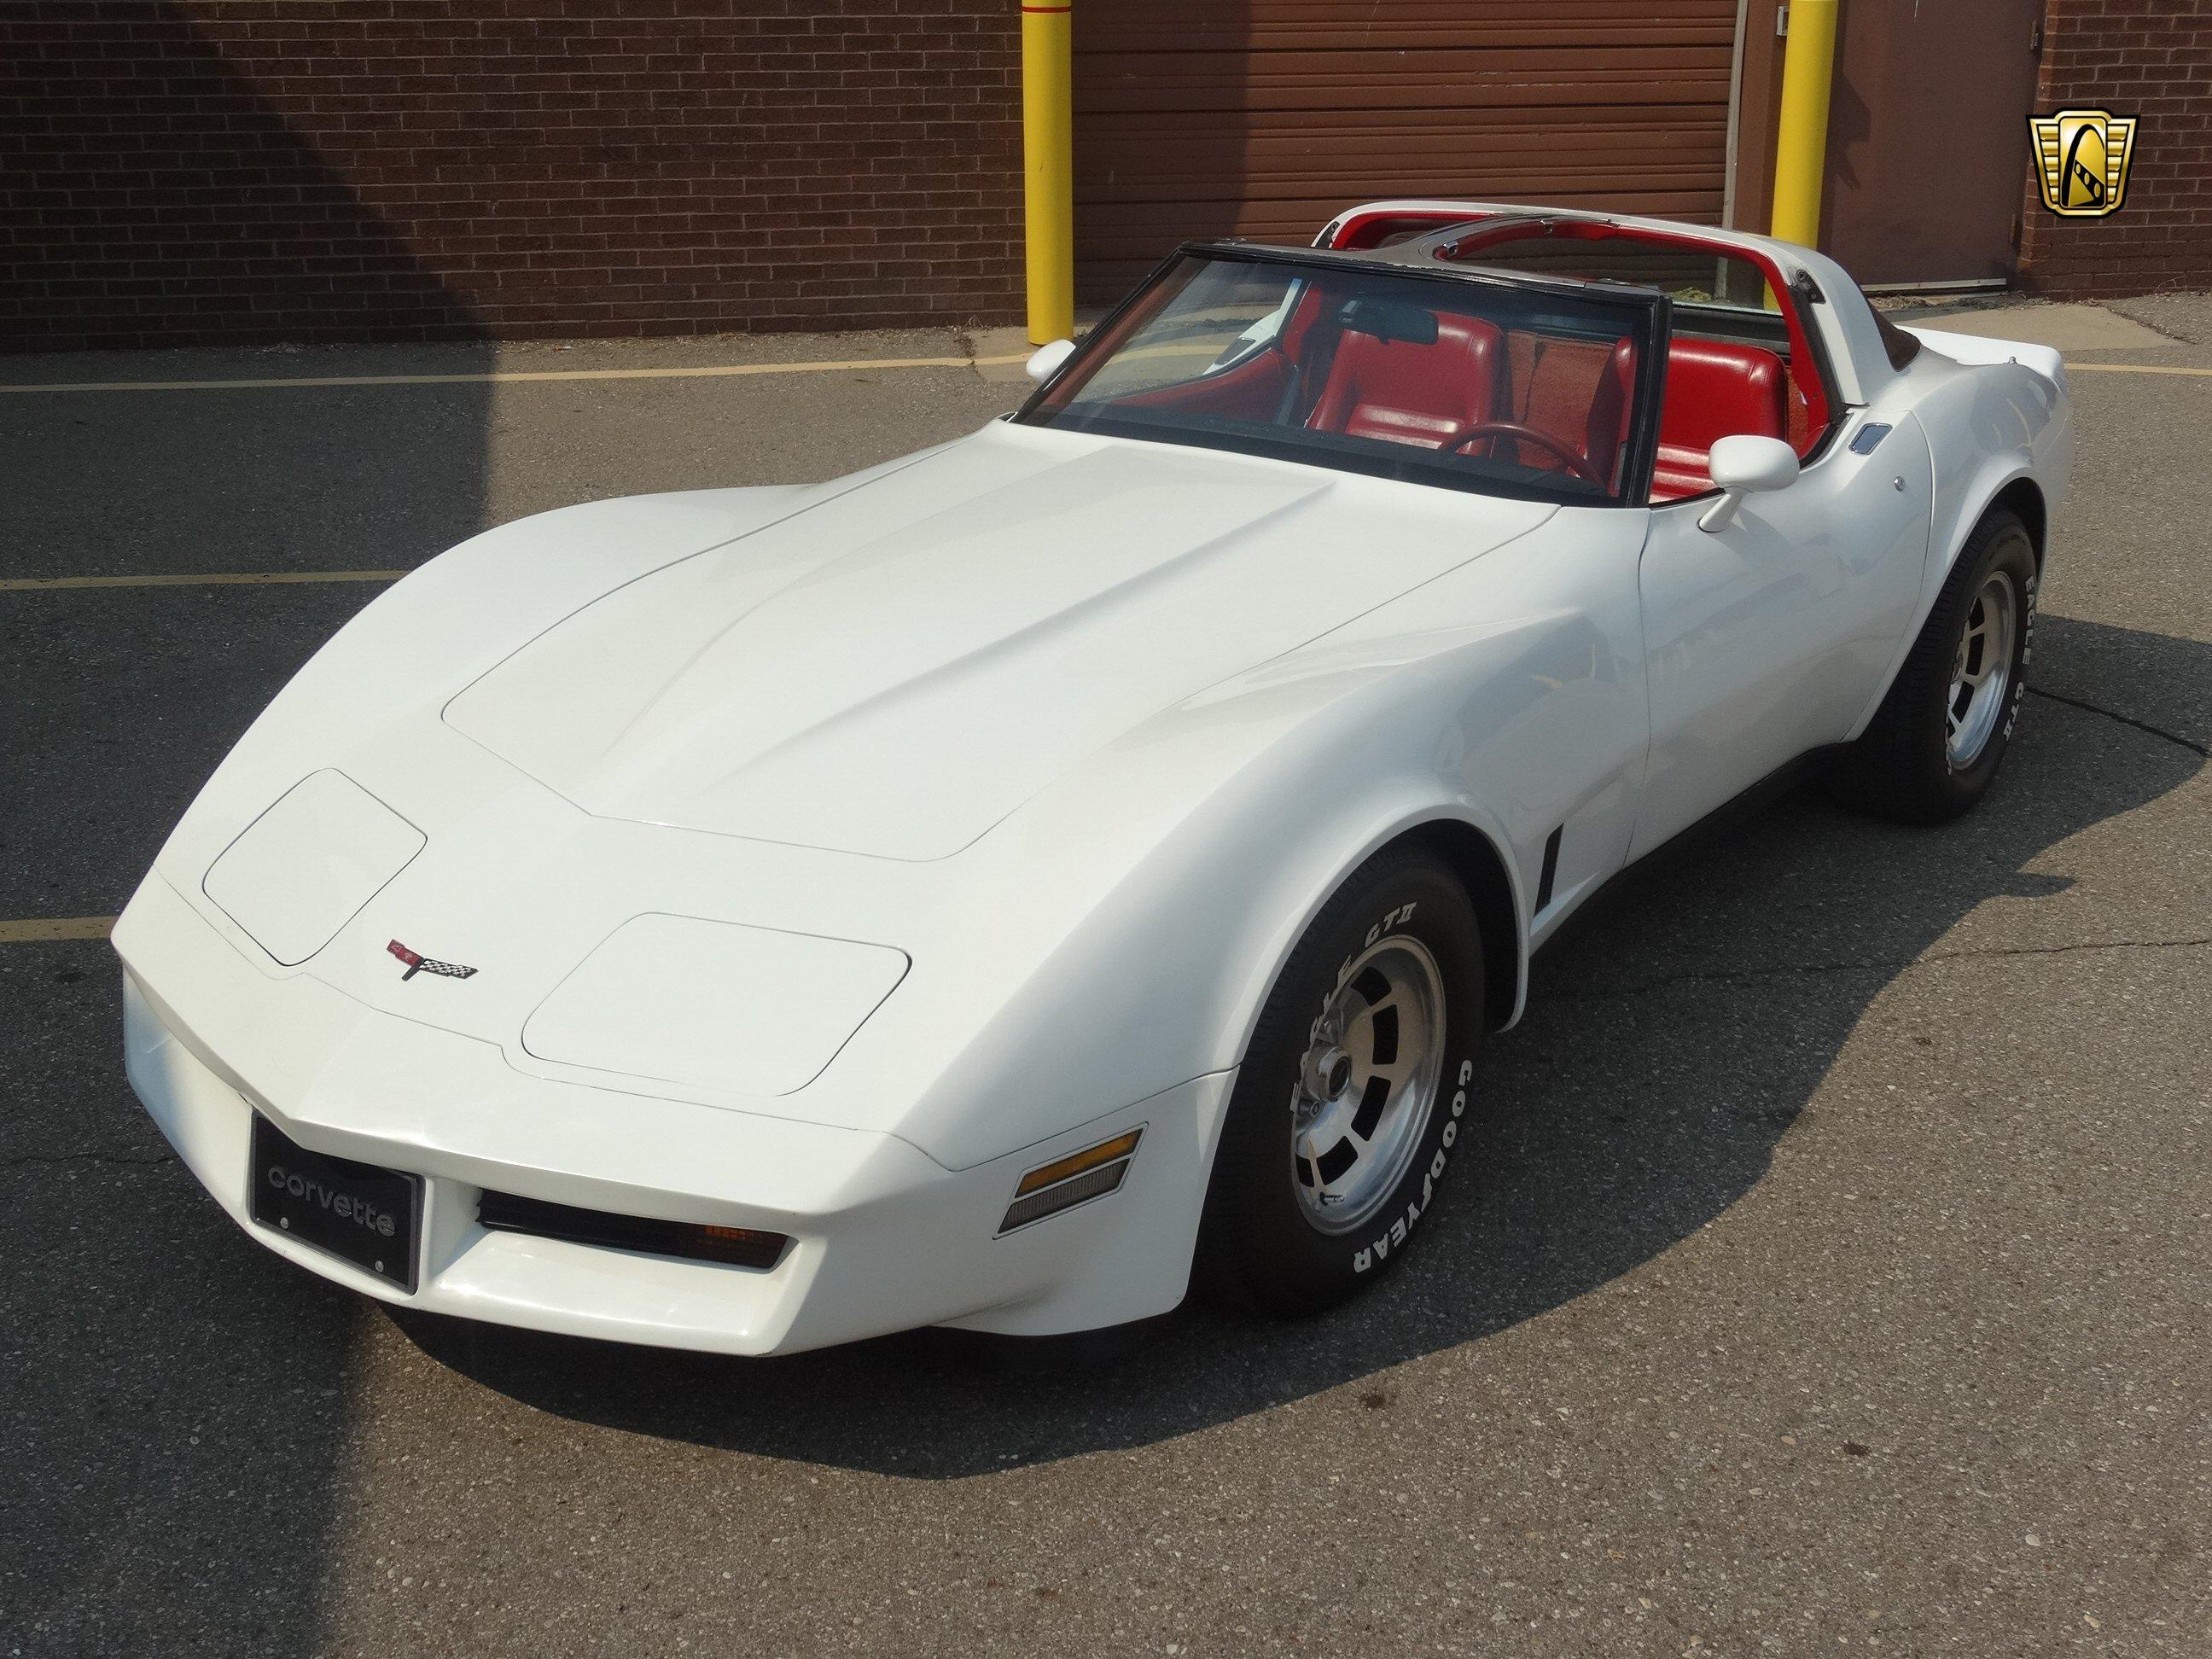 1981 C3 Chevrolet Chevy Corvette Coupe White Classic